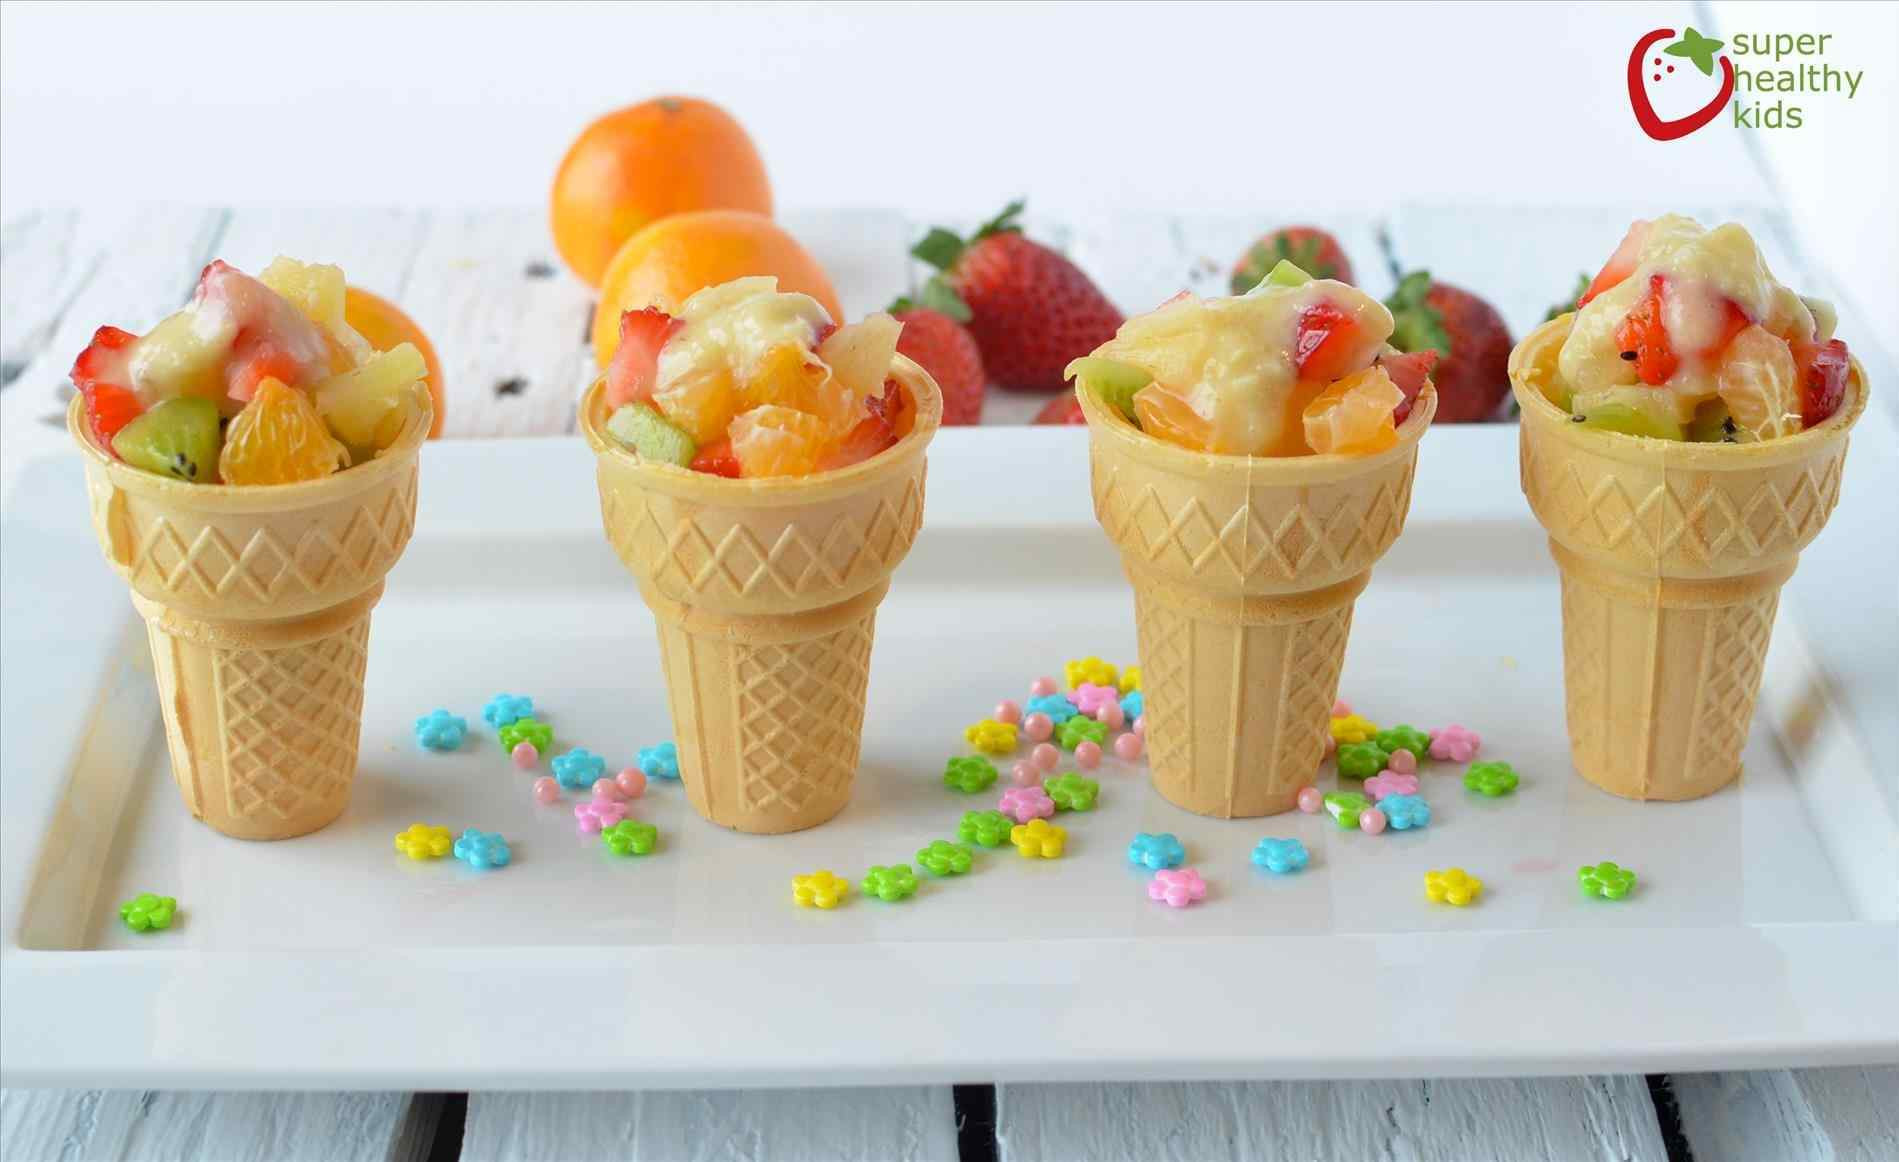 Healthy Desserts For Kids  Healthy Desserts For Kids 2018 OgaHealth